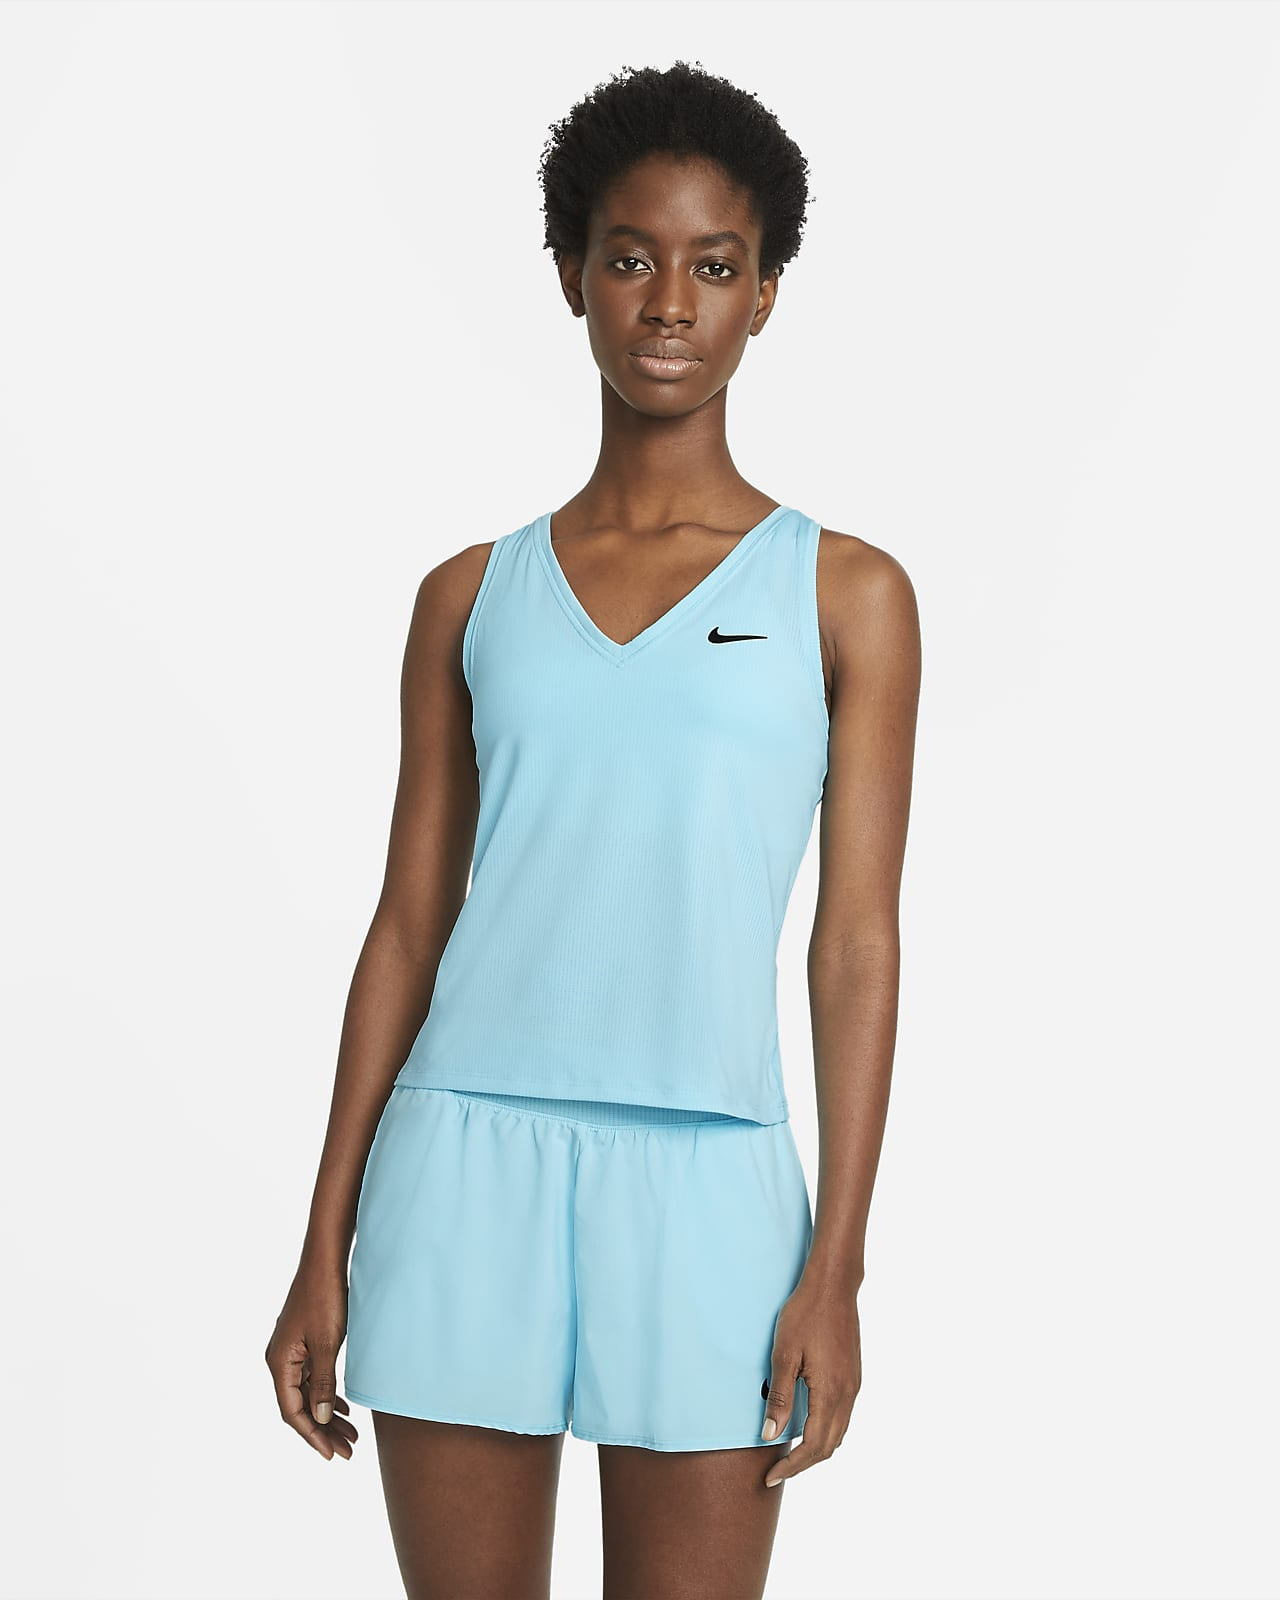 Женская теннисная майка NikeCourt Victory